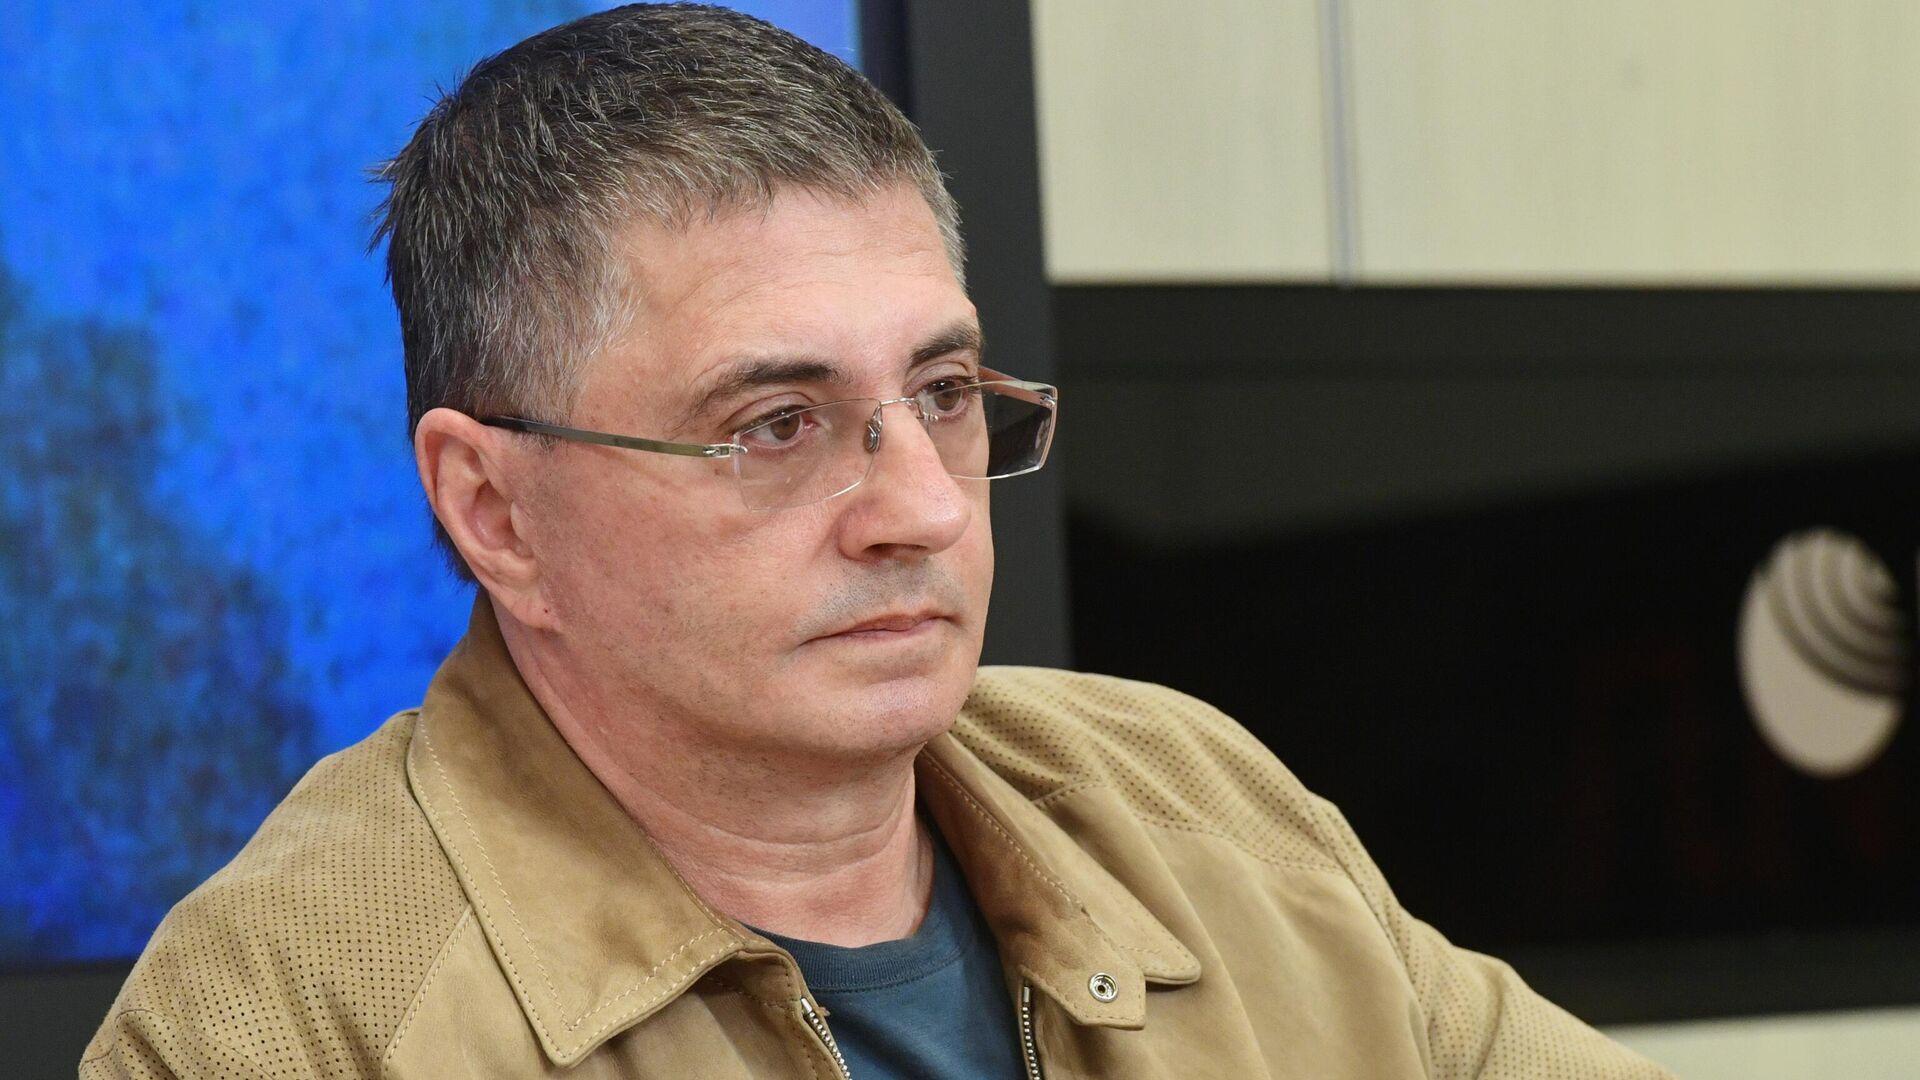 Врач Александр Мясников во время пресс-конференции - РИА Новости, 1920, 22.06.2021